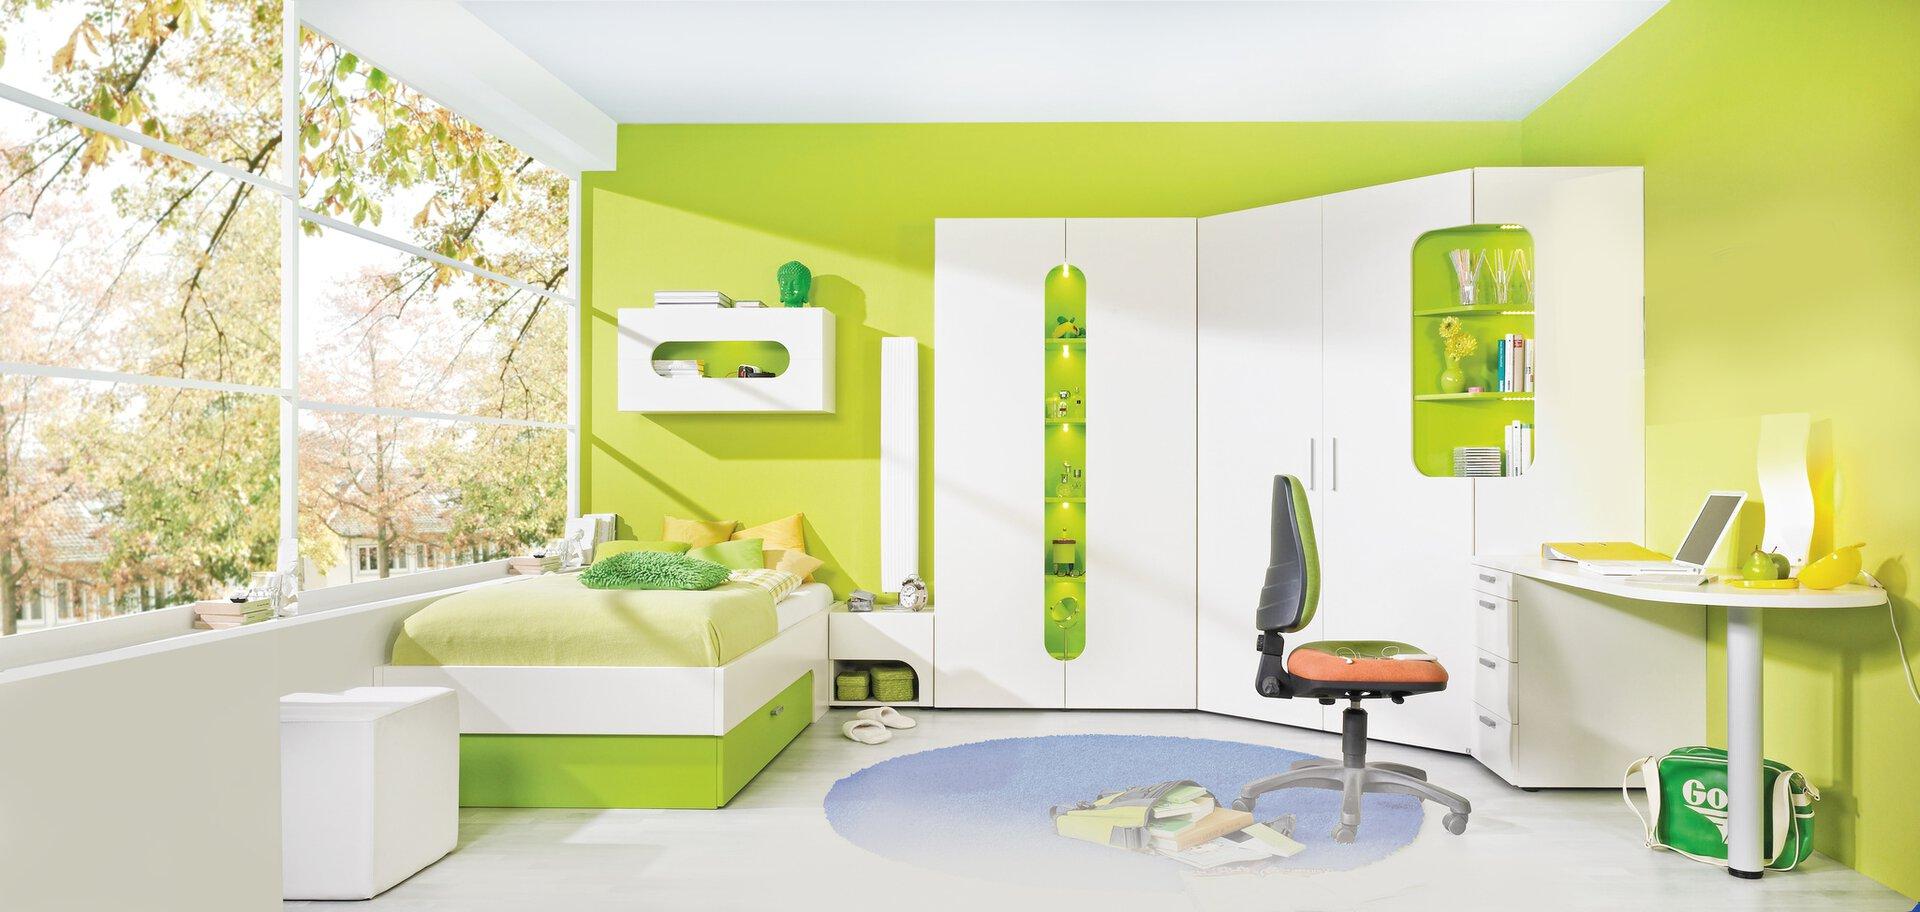 Kinderschrank MAX-I Möbelfabrik Rudolf Holzwerkstoff weiß 2 x 1 cm